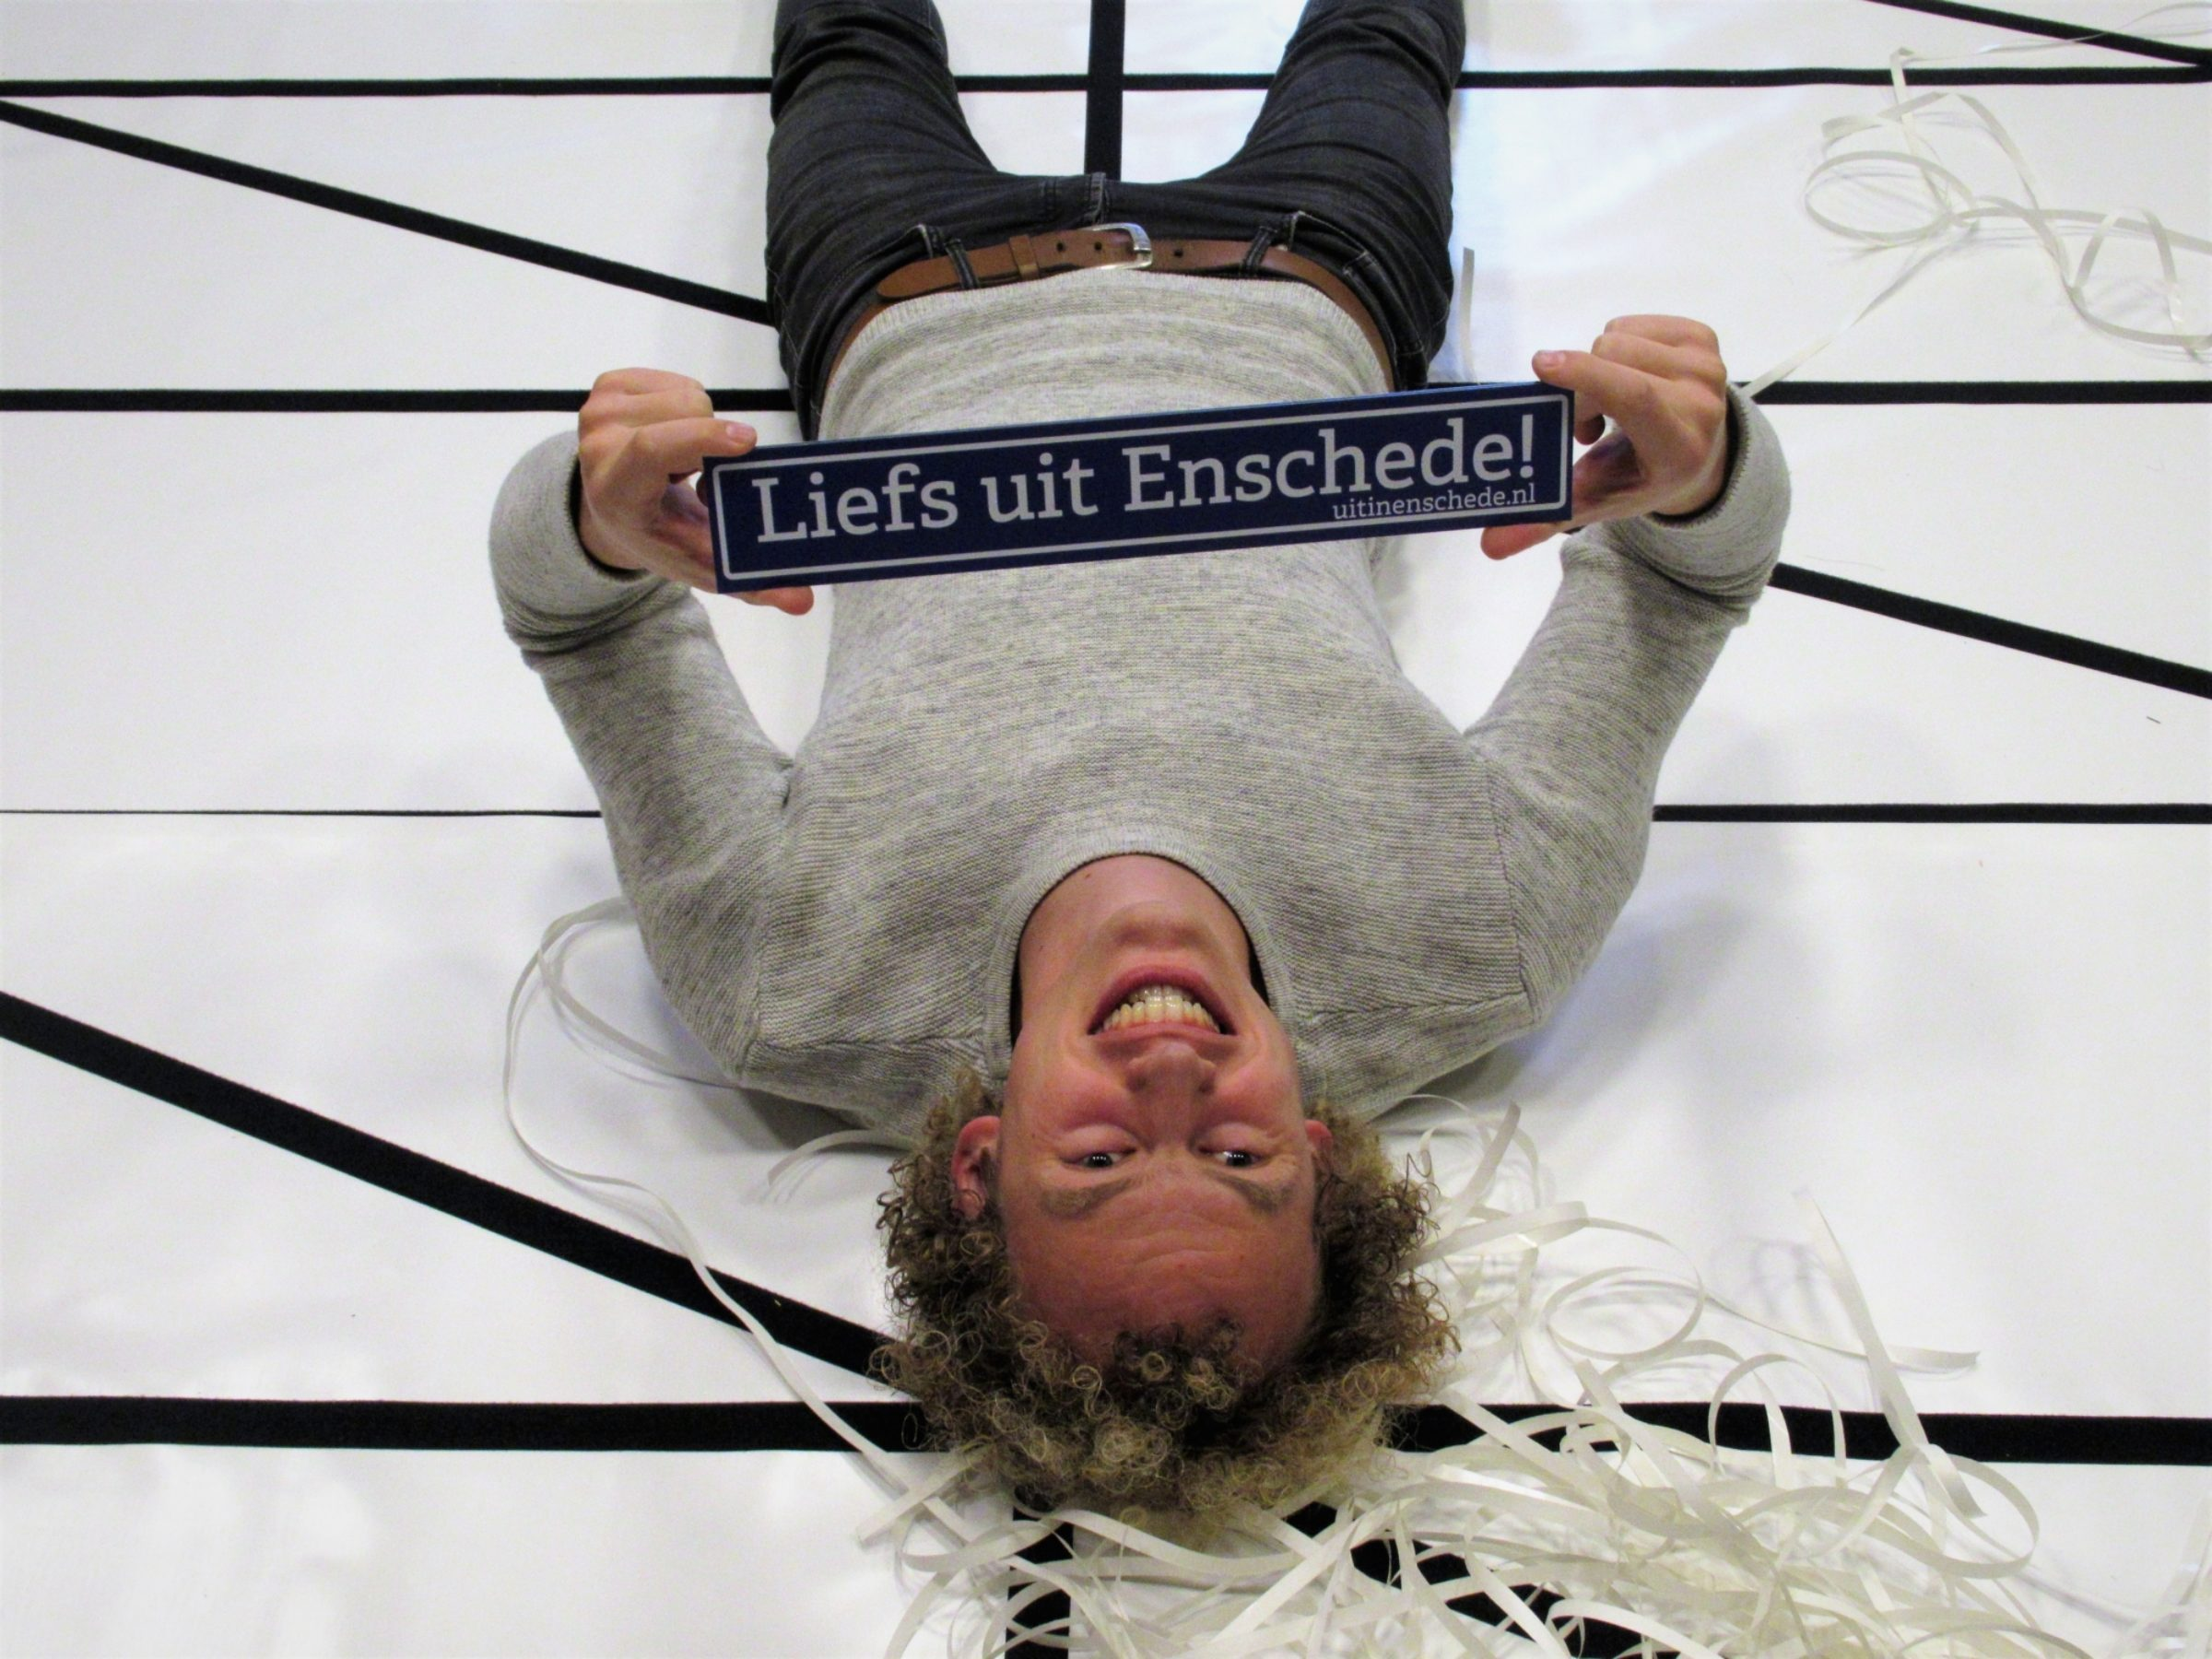 2017 Liefs Uit Enschede Theater Sonnevanck Marketing En Campagnes